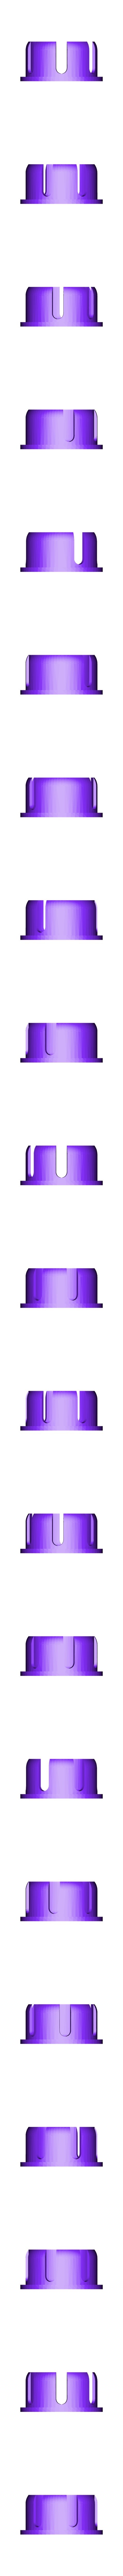 capuchon v2.STL Download free STL file Portable ashtray • 3D printer model, Lys